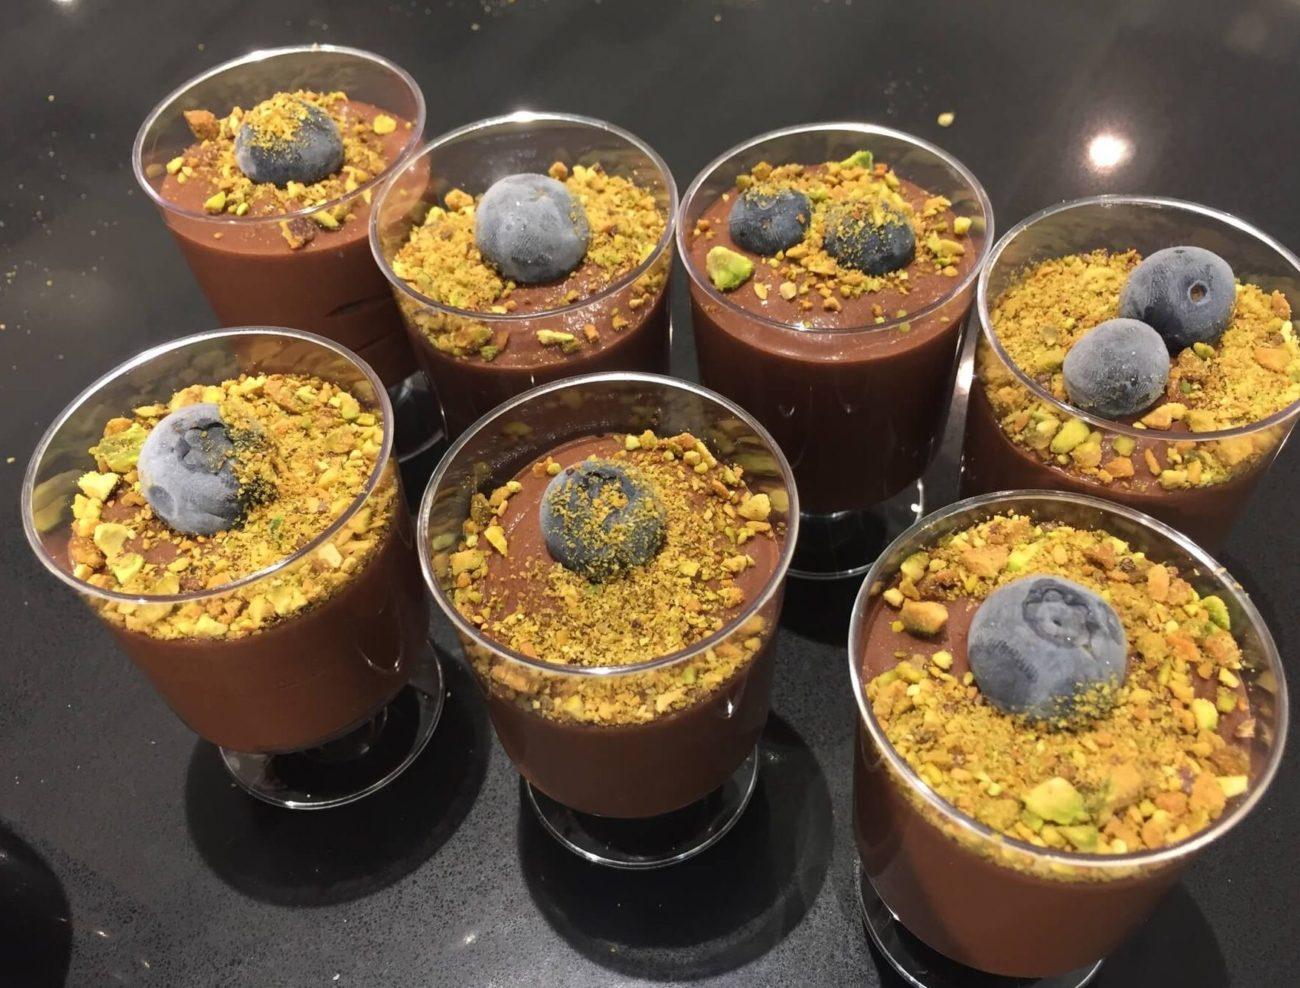 Decadent Creamy Chocolate Mousse Recipe